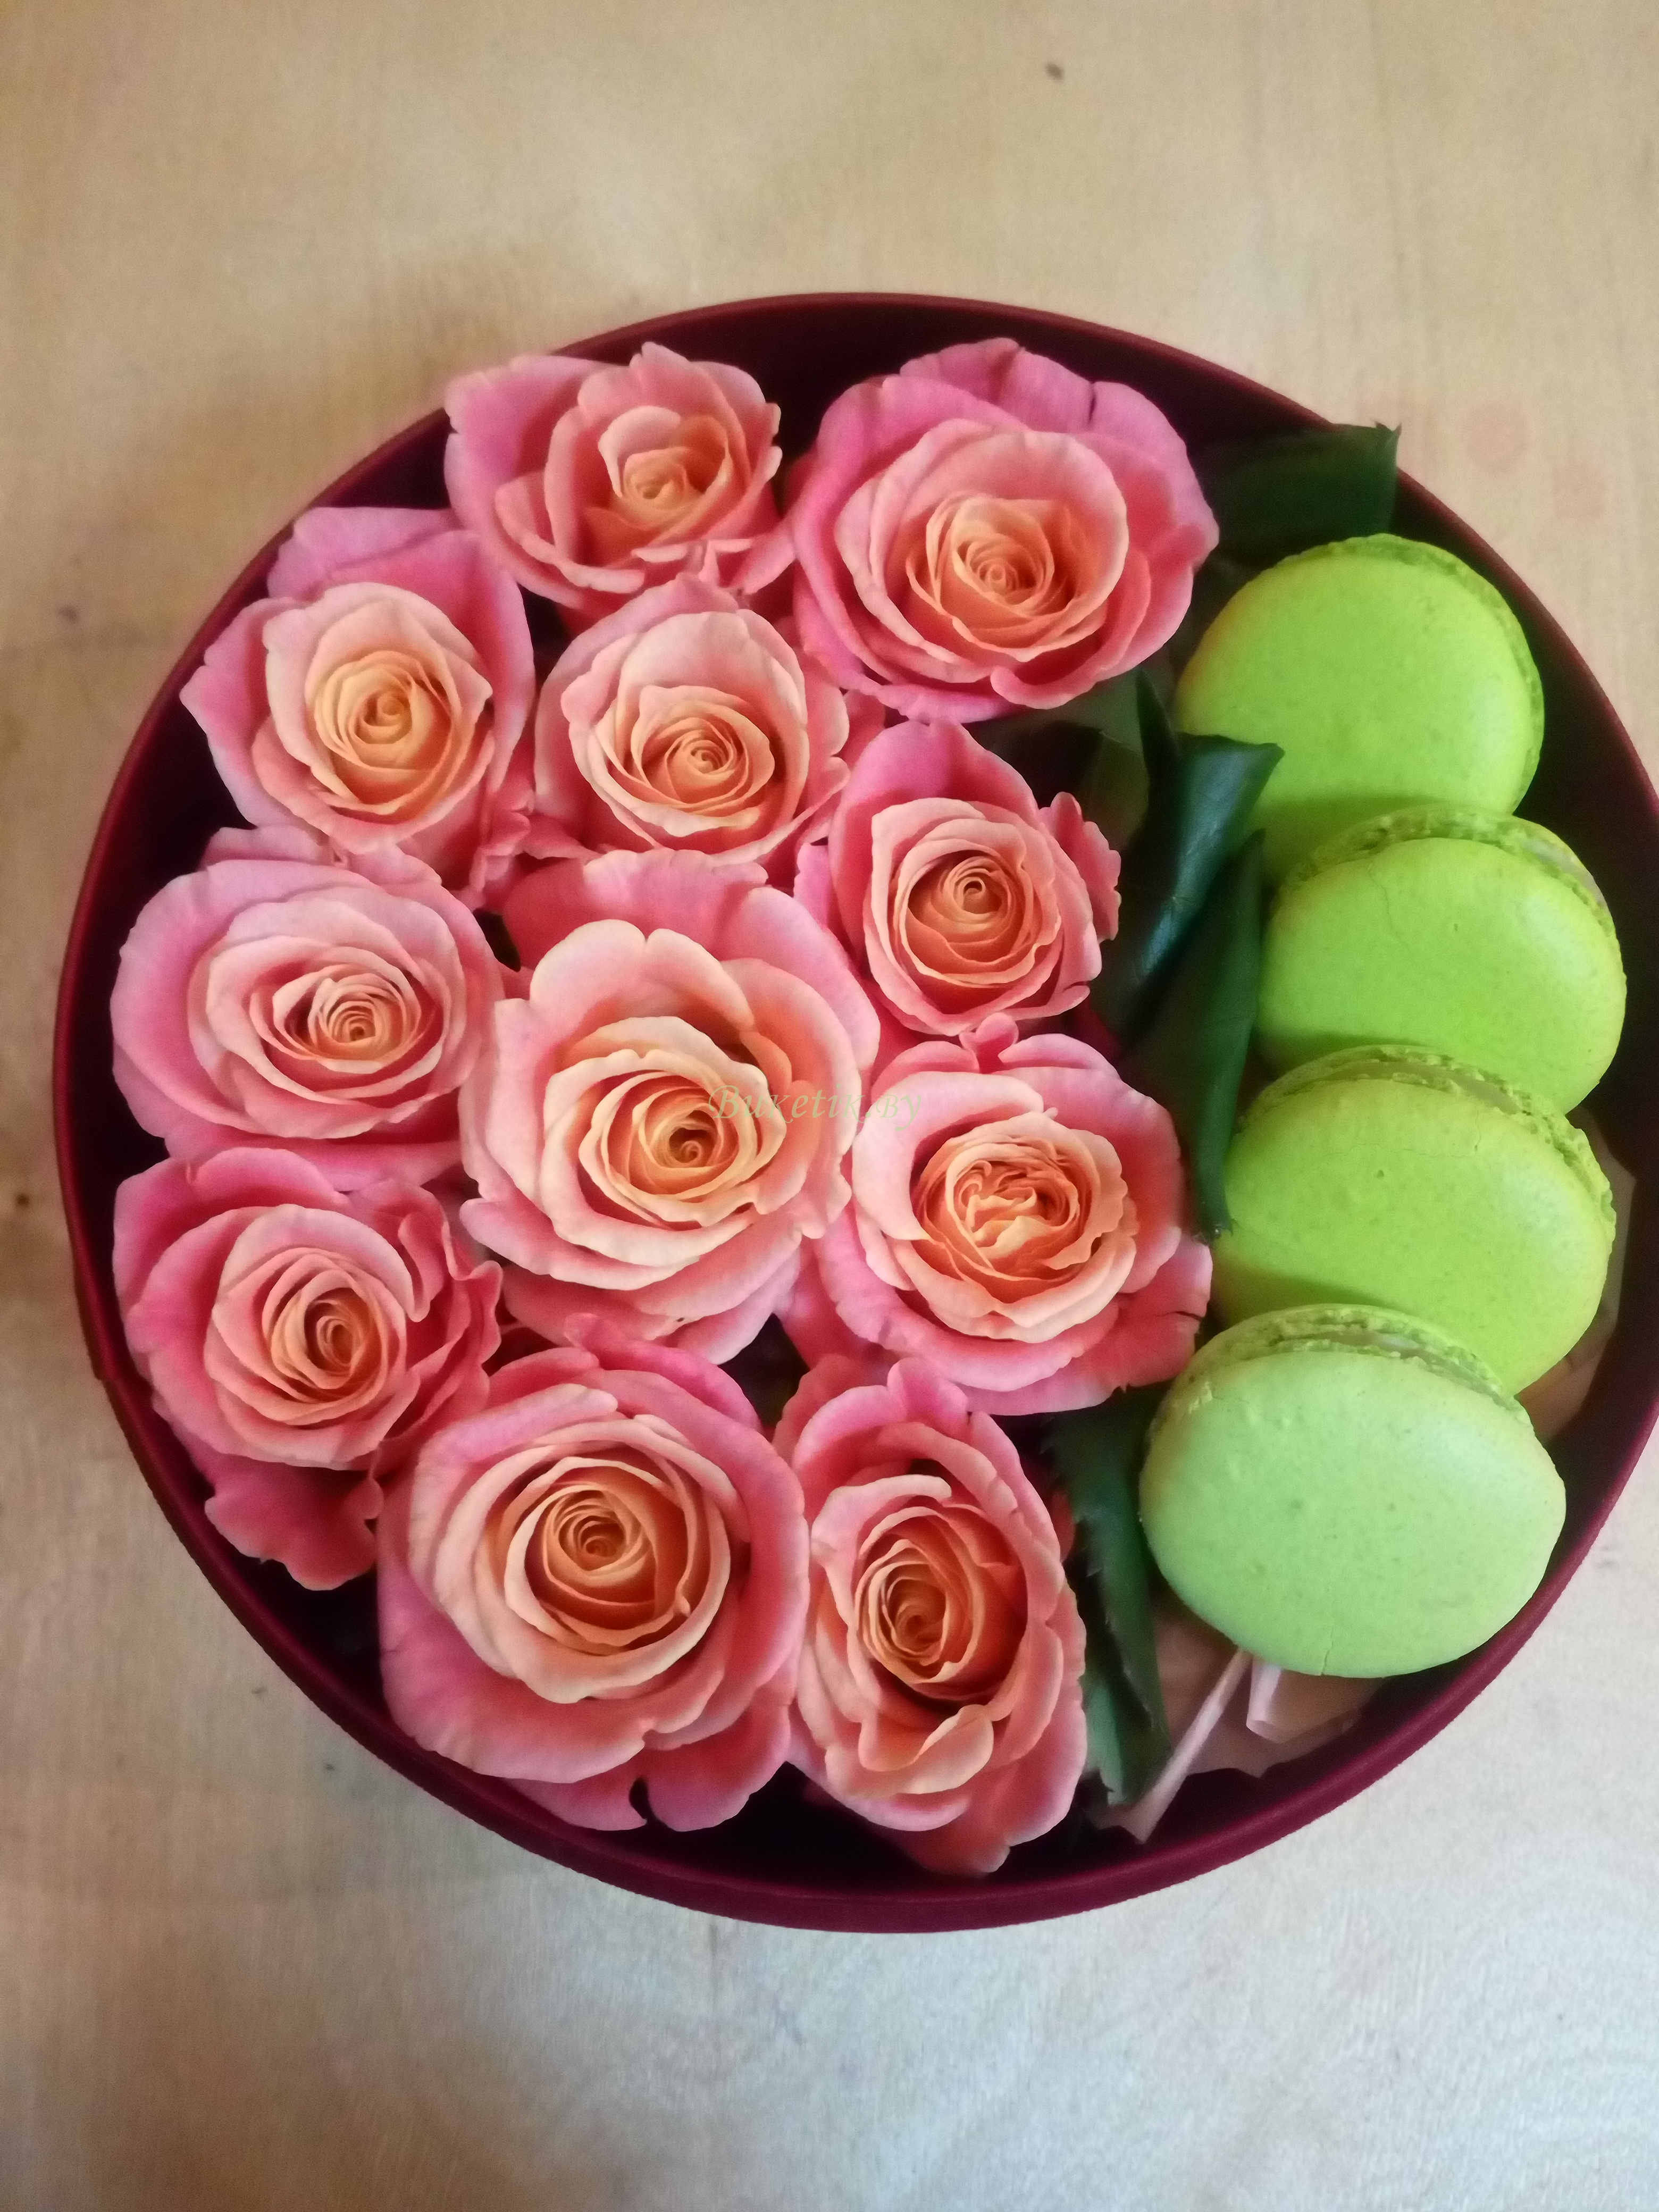 Коробка с розами и 'Макаронами'